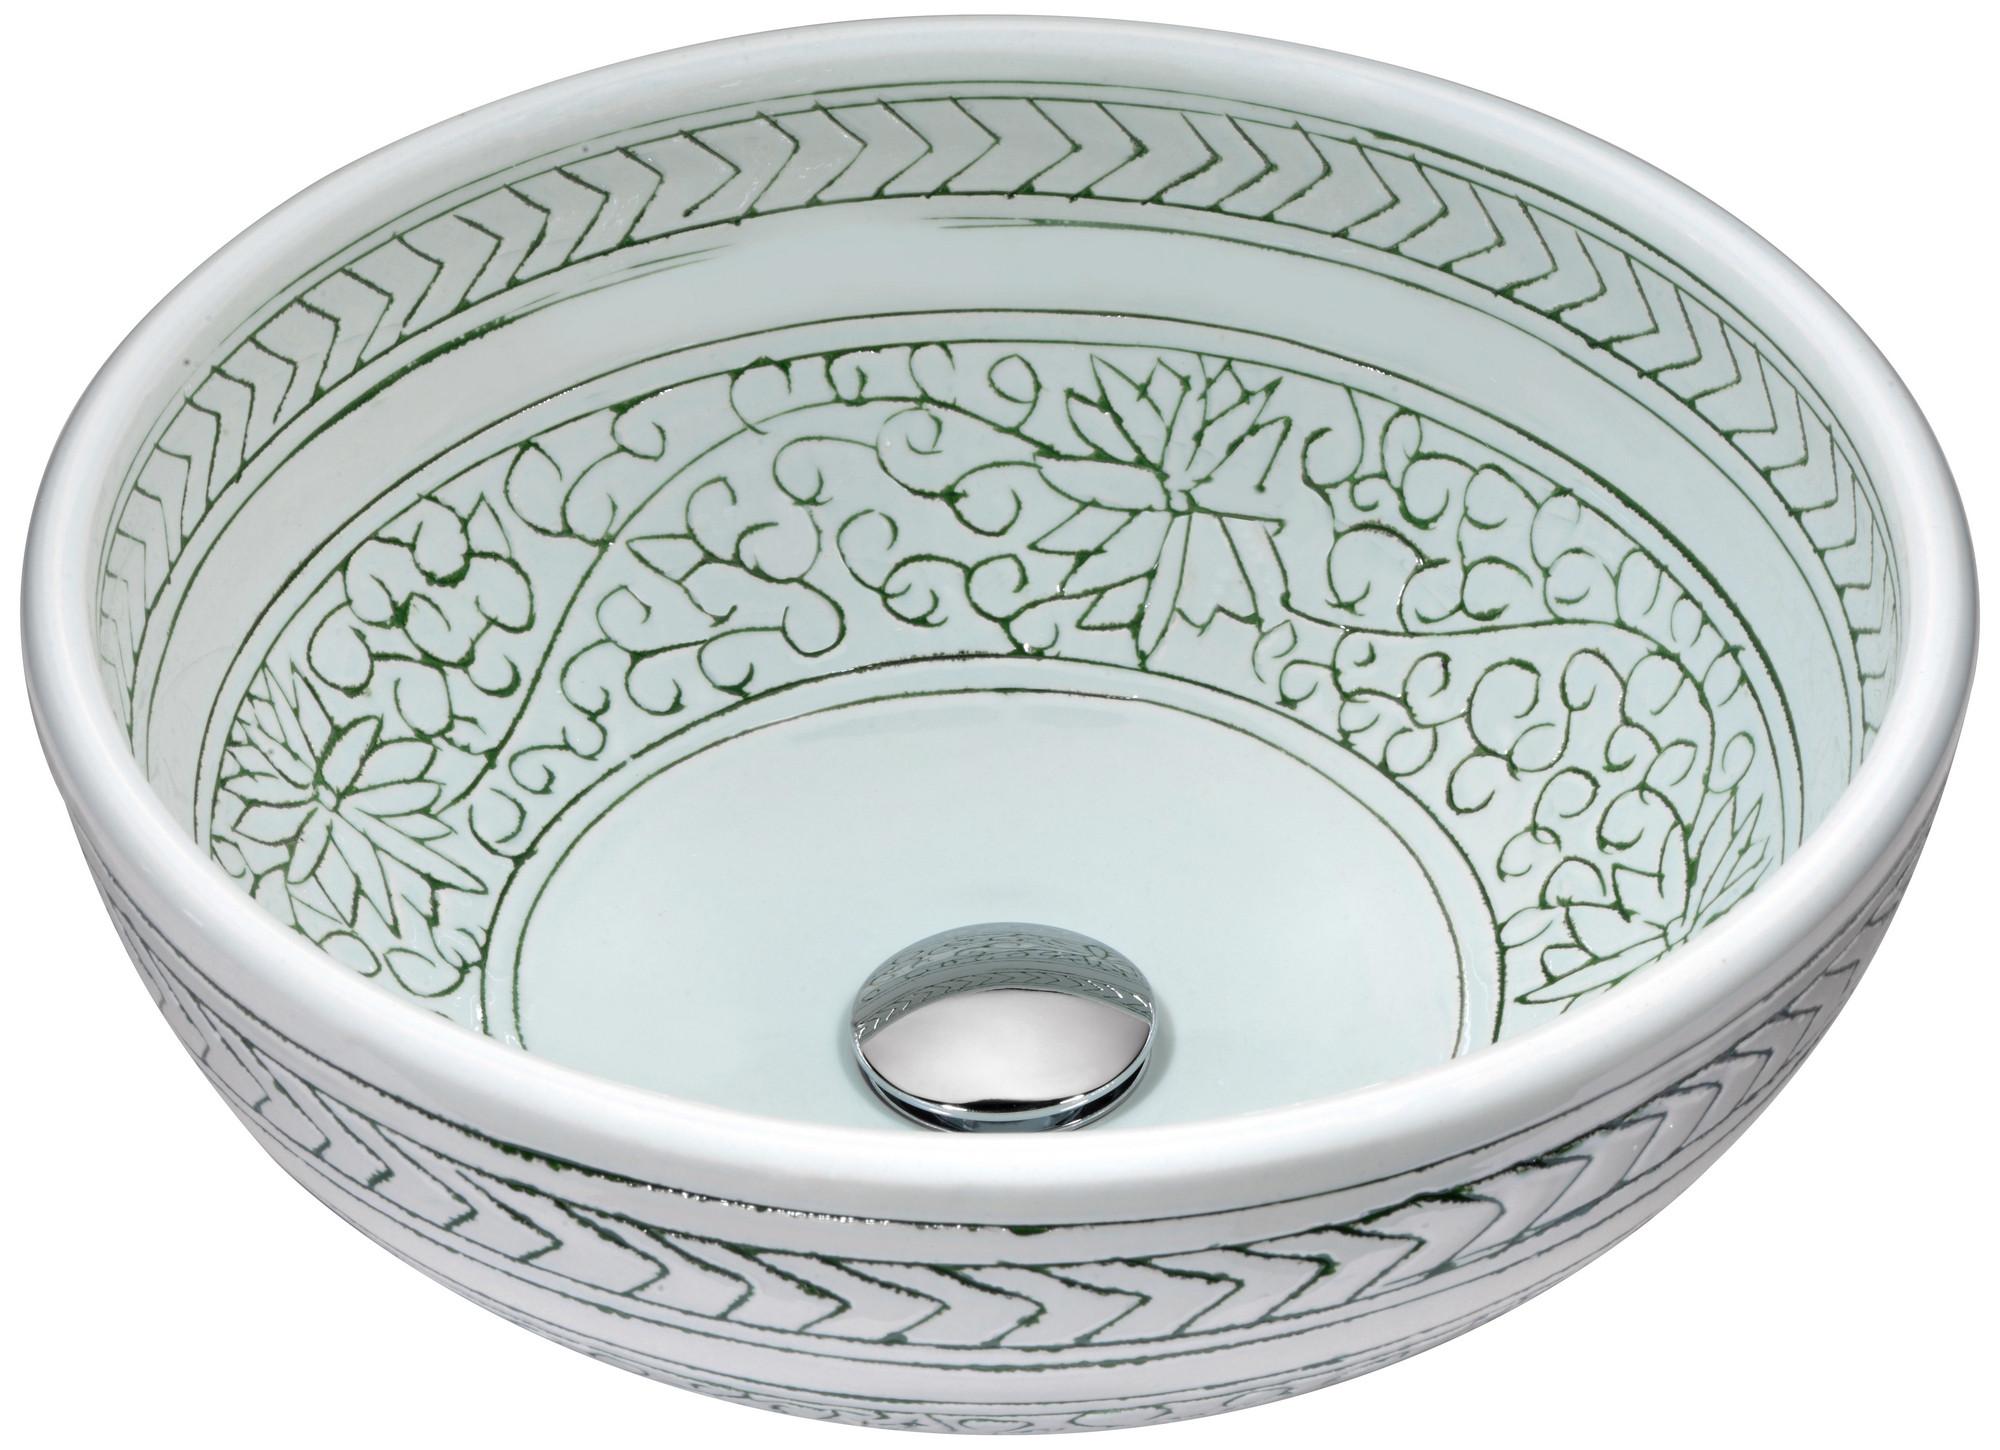 ANZZI LS-AZ185 Cadence Series Deco-Glass Vessel Sink In Décor White